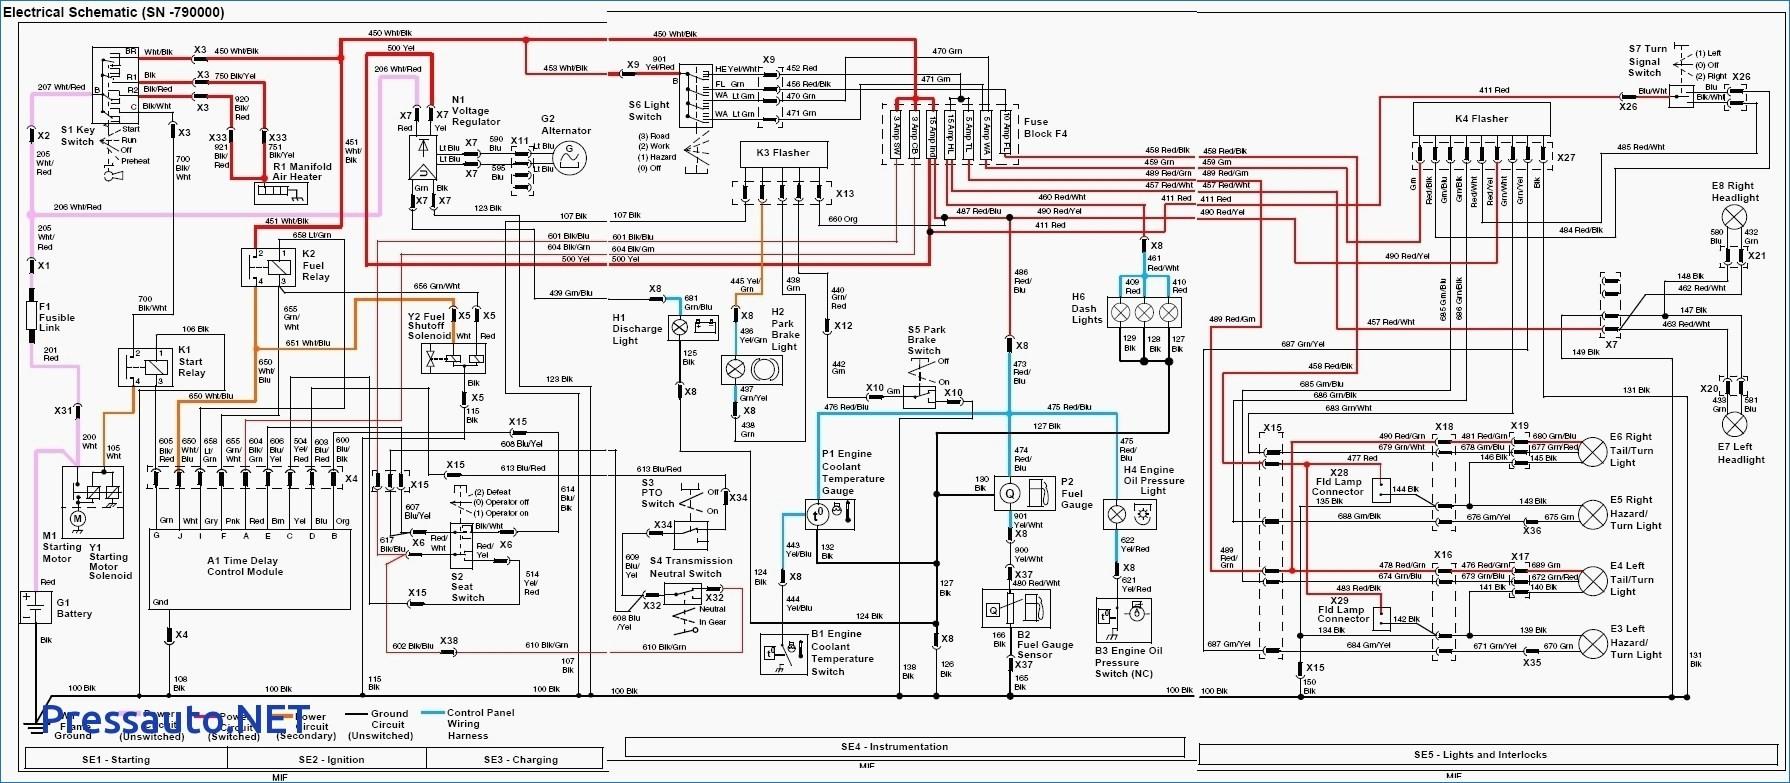 John Deere Z425 Wiring Diagram | Wiring Diagram on john deere la140 wiring diagram, john deere la115 wiring diagram, john deere x360 wiring diagram, john deere x475 wiring diagram, john deere x304 wiring diagram, john deere la120 wiring diagram, john deere la125 wiring diagram, john deere la165 wiring diagram, john deere lx280 wiring diagram, john deere x324 wiring diagram, john deere ignition wiring diagram, john deere x534 wiring diagram, john deere d140 wiring diagram, john deere d170 wiring diagram, john deere x720 wiring diagram, john deere x740 wiring diagram, john deere z245 wiring diagram, john deere z445 wiring diagram, john deere x495 wiring diagram, john deere g100 wiring diagram,